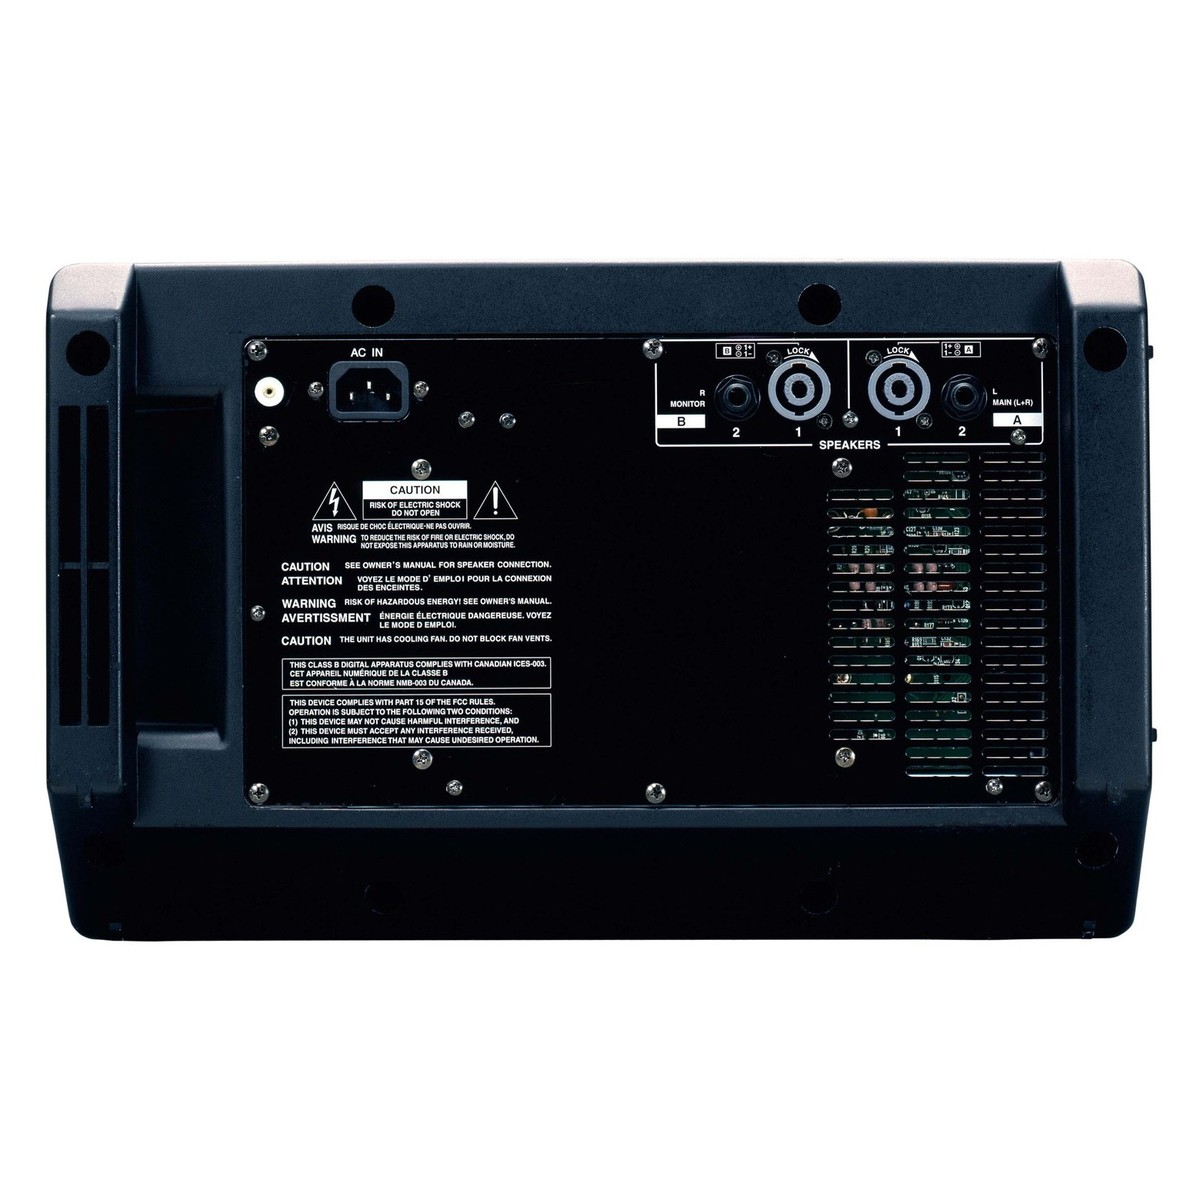 Yamaha emx512sc table de mixage amplifi e - Table de mixage amplifiee yamaha ...